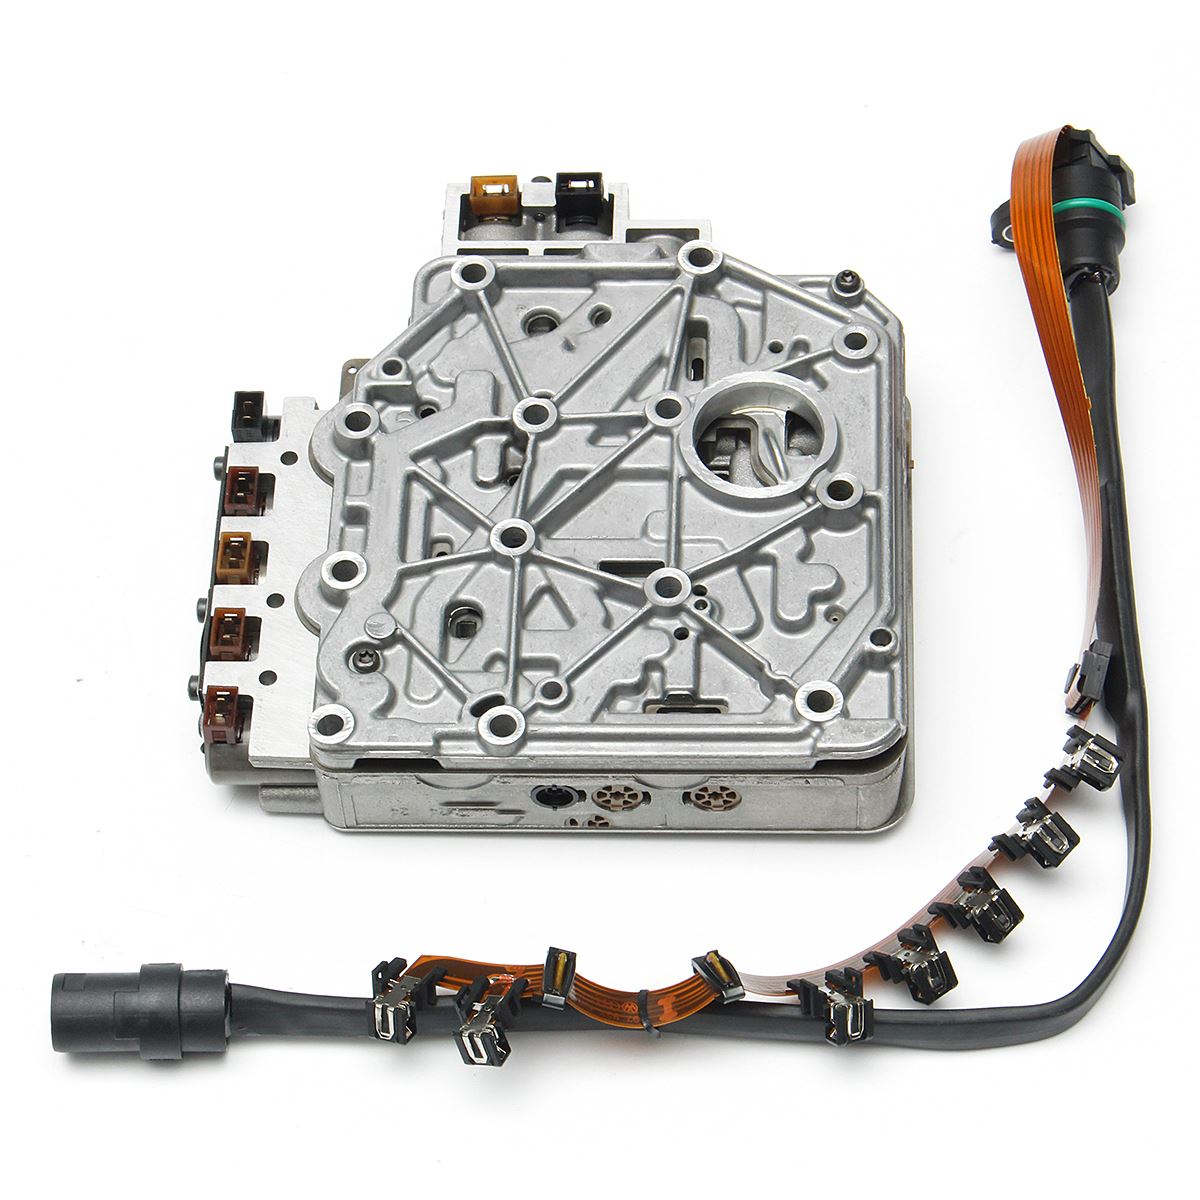 Vw Beetle Transmission Diagram Nissan Primera P12 Wiring Automatic Replacement Tiguan